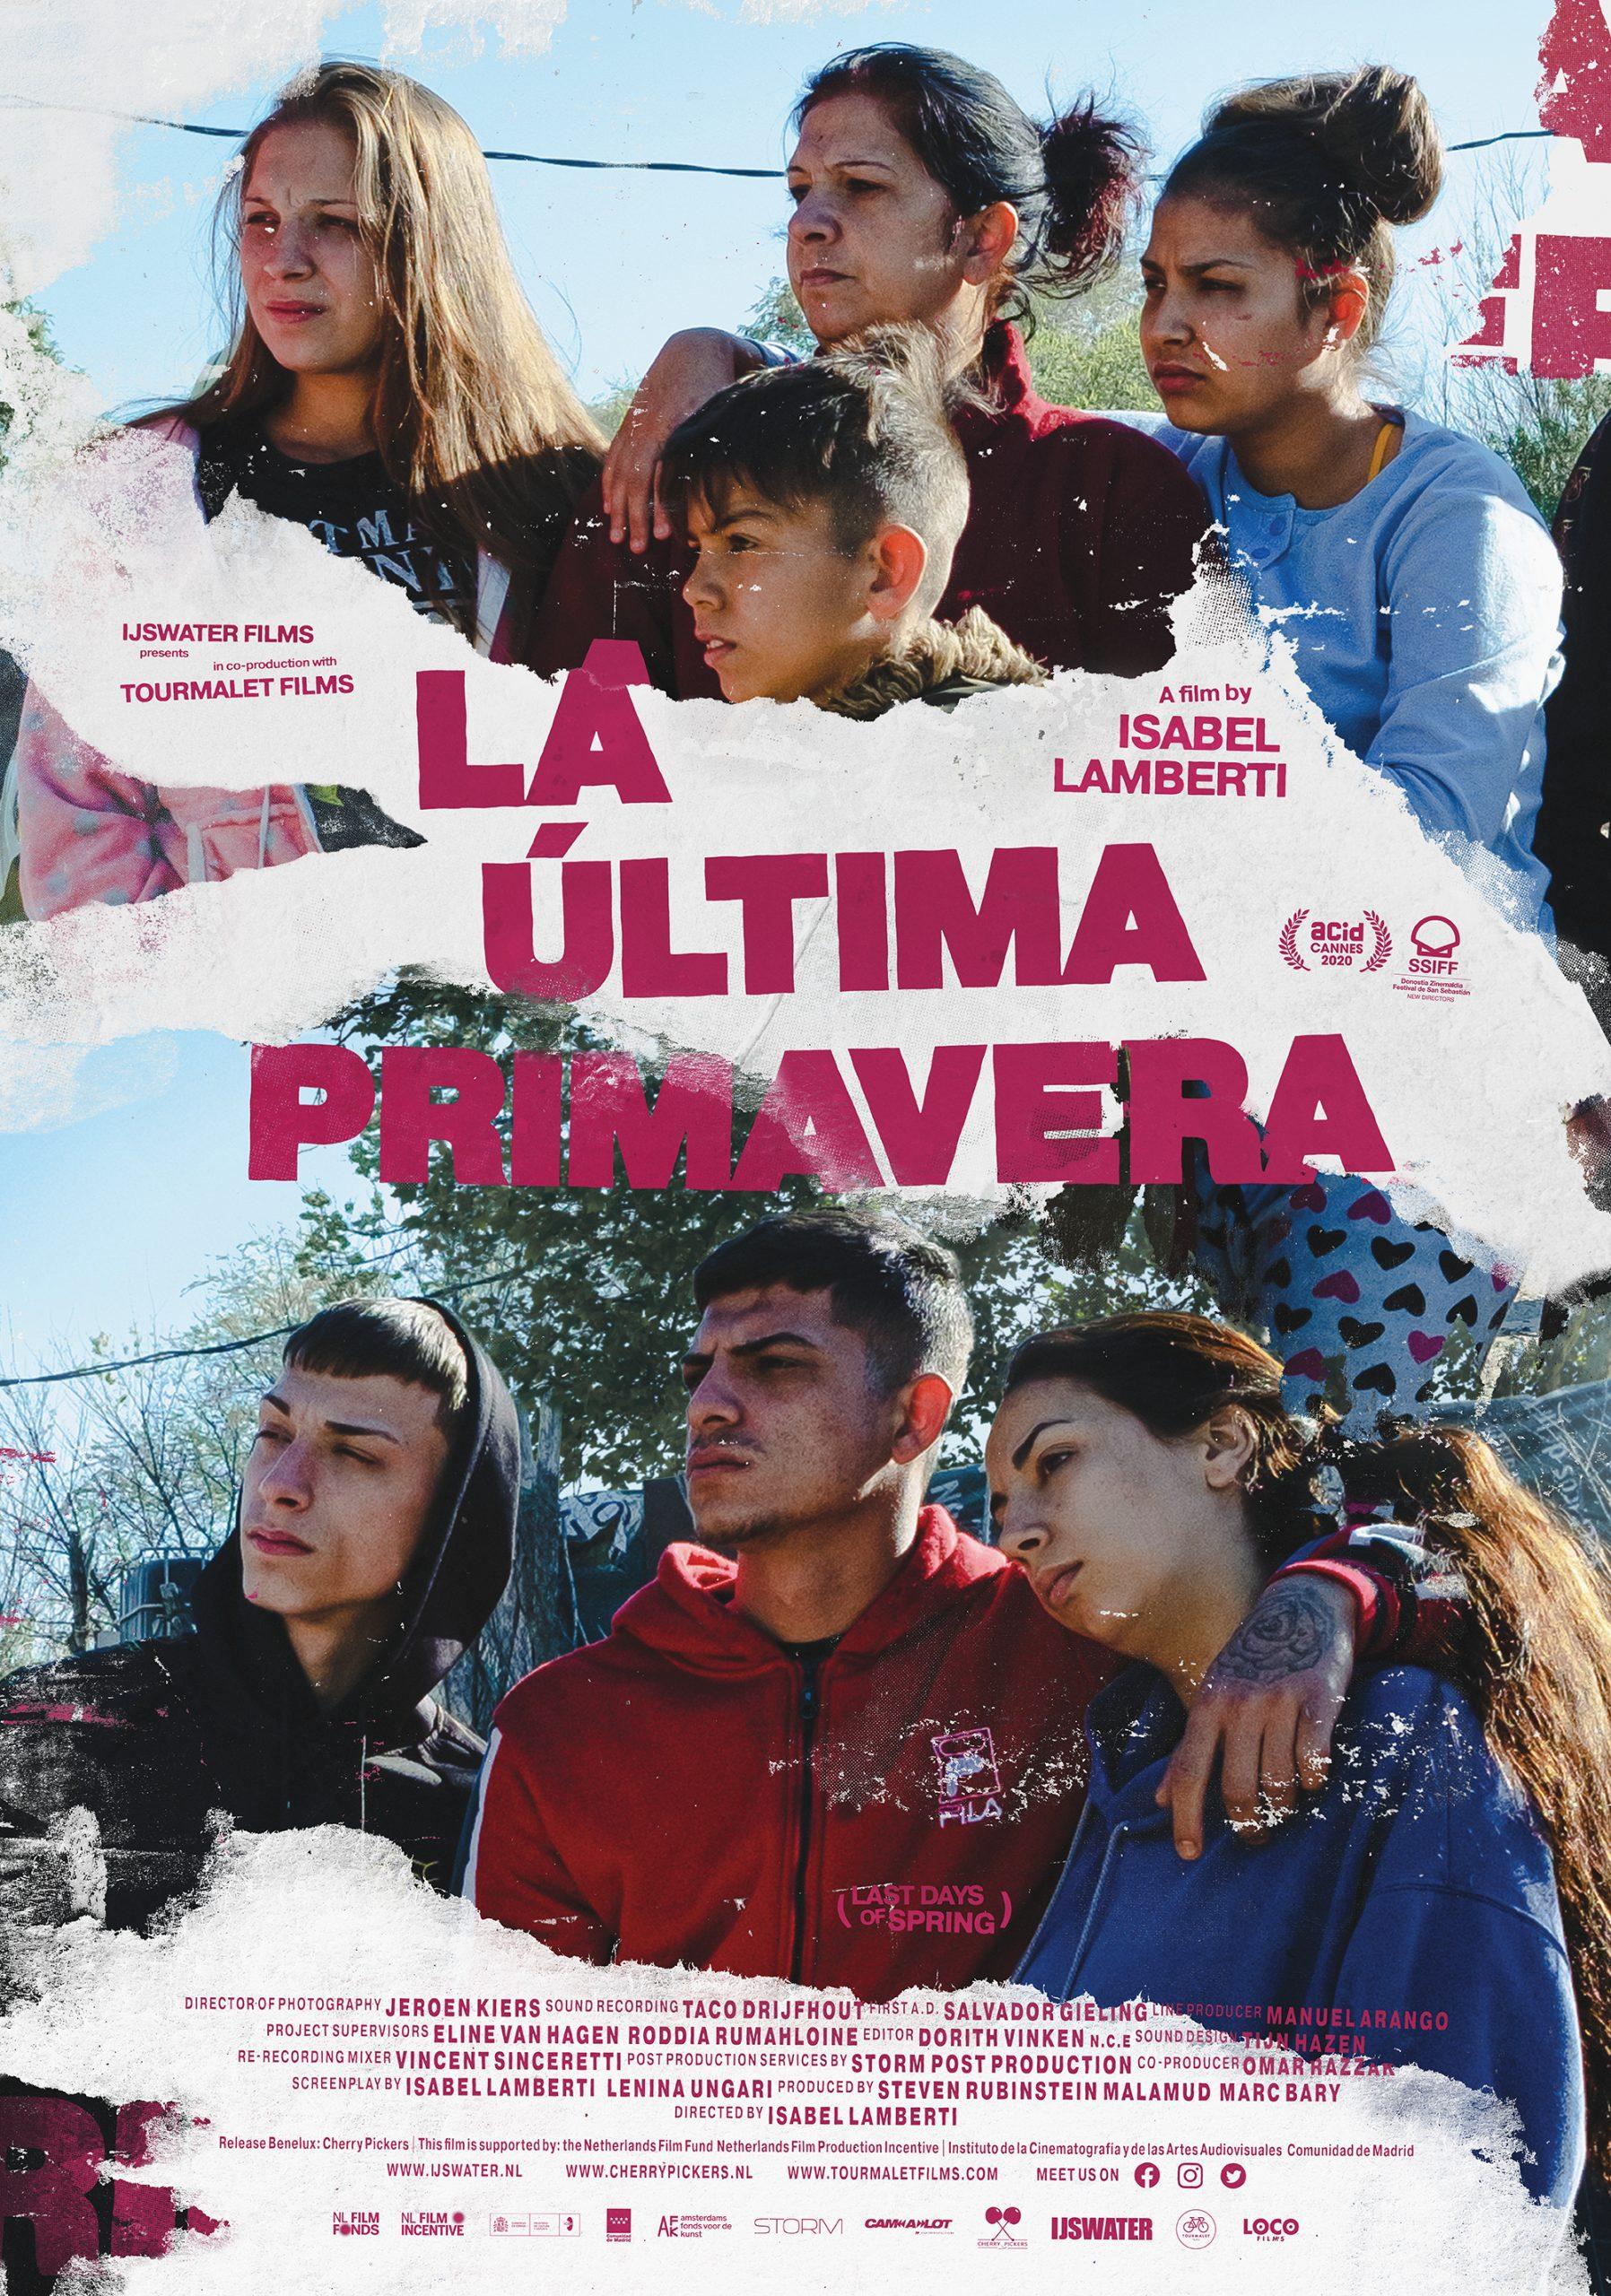 LA ÚLTIMA PRIMAVERA in world Premiere at San Sebastián Film Festival, New Directors Competition – September 21, 2020.